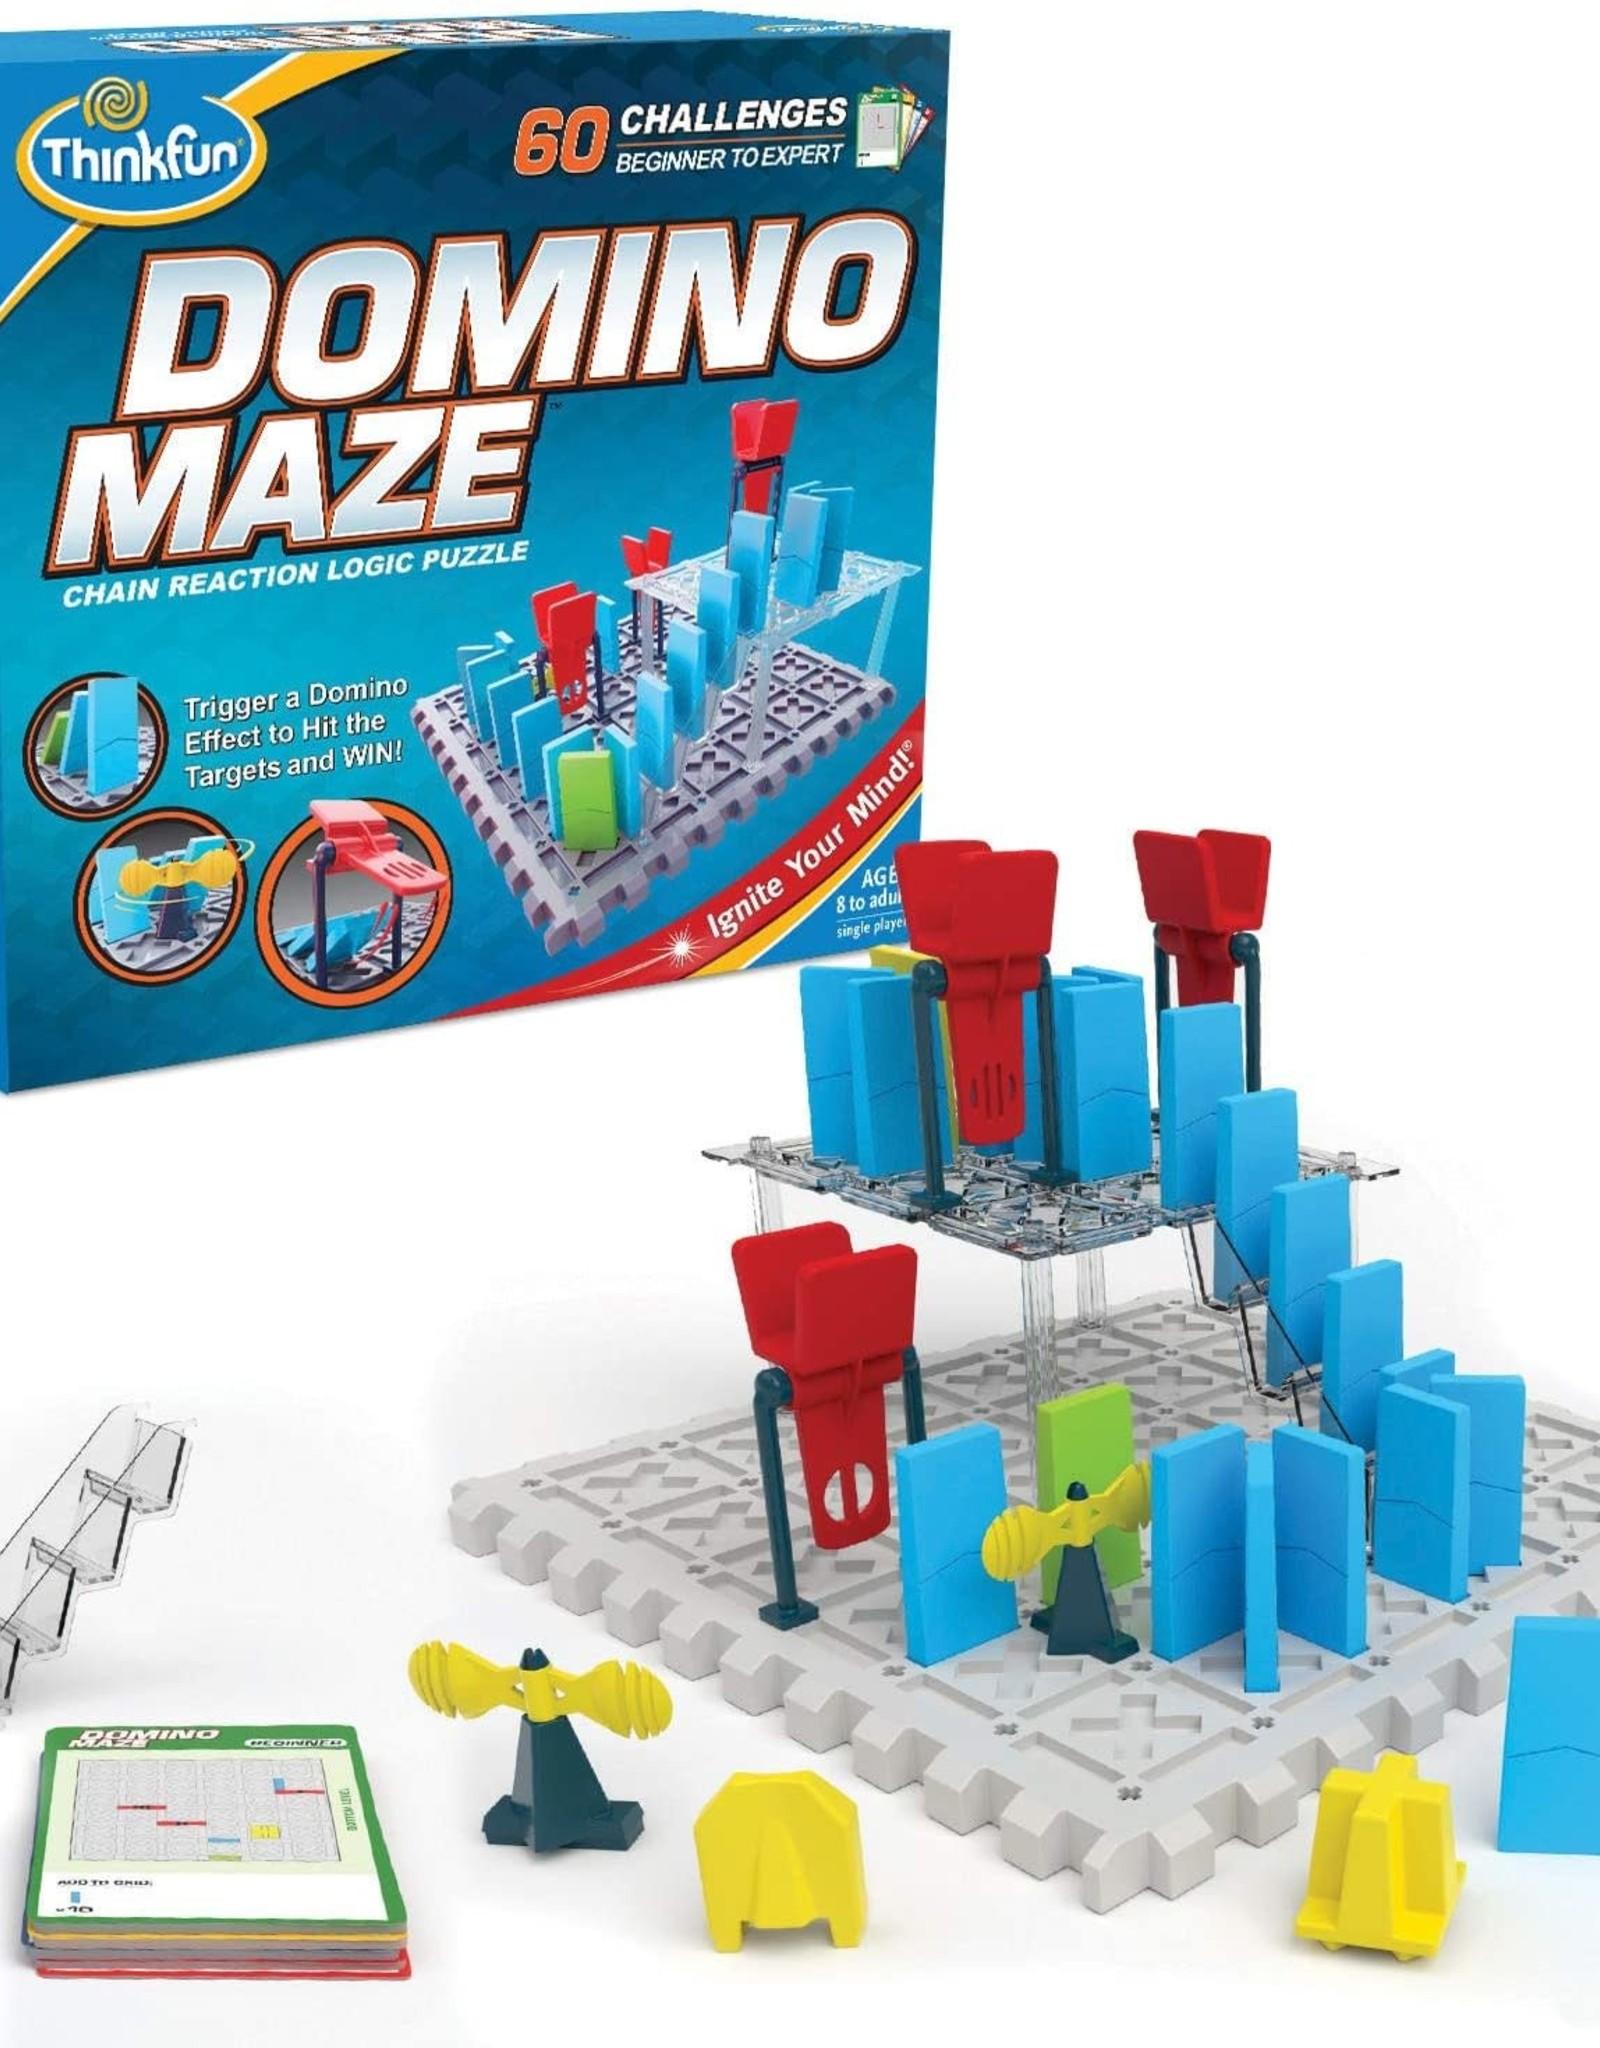 ThinkFun Domino Maze Game